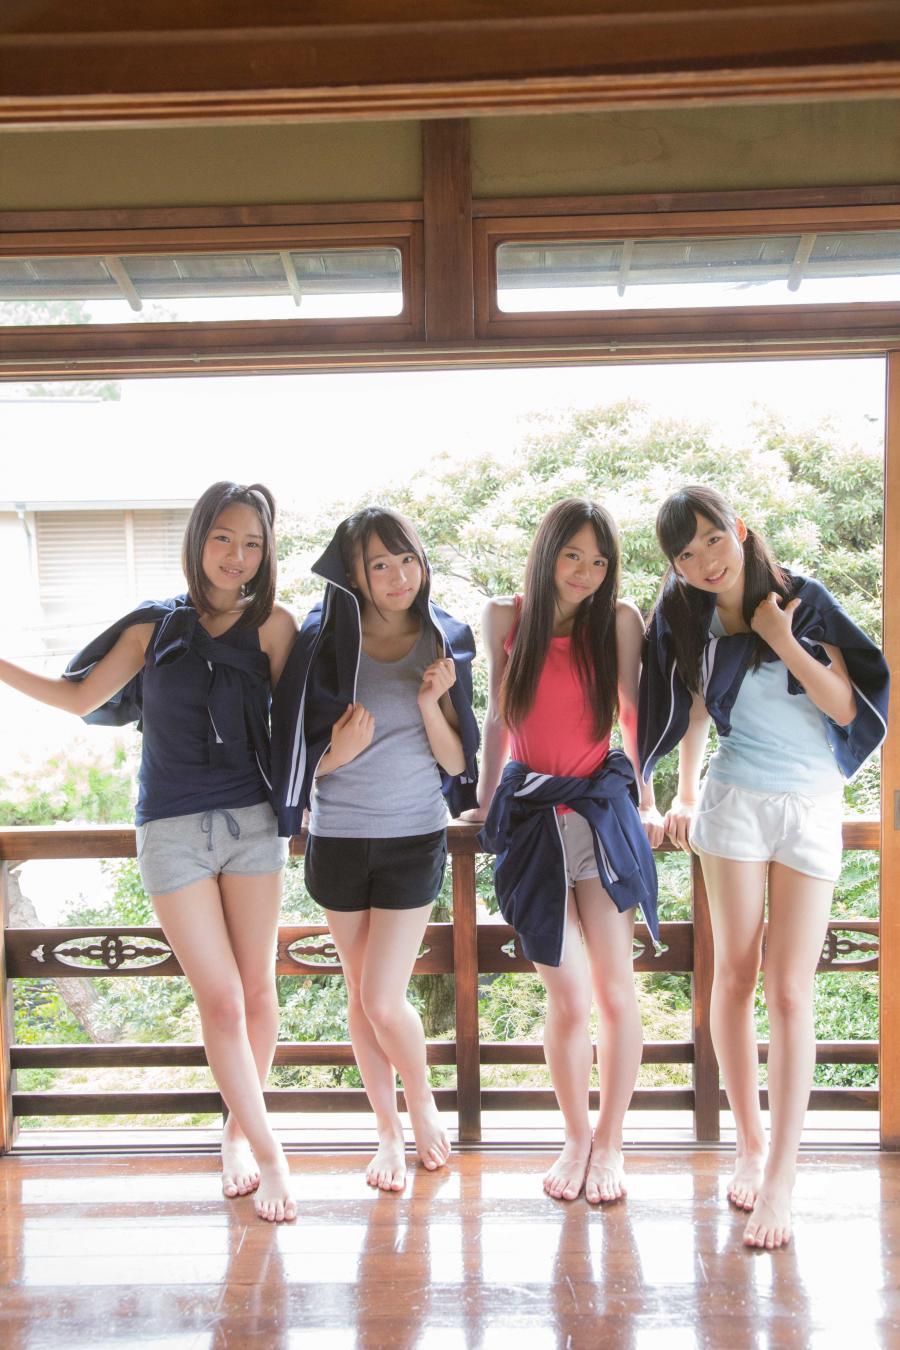 AKB48 チーム8 エロ画像 8月29日(土)発売の『月刊エンタメ』にチーム8